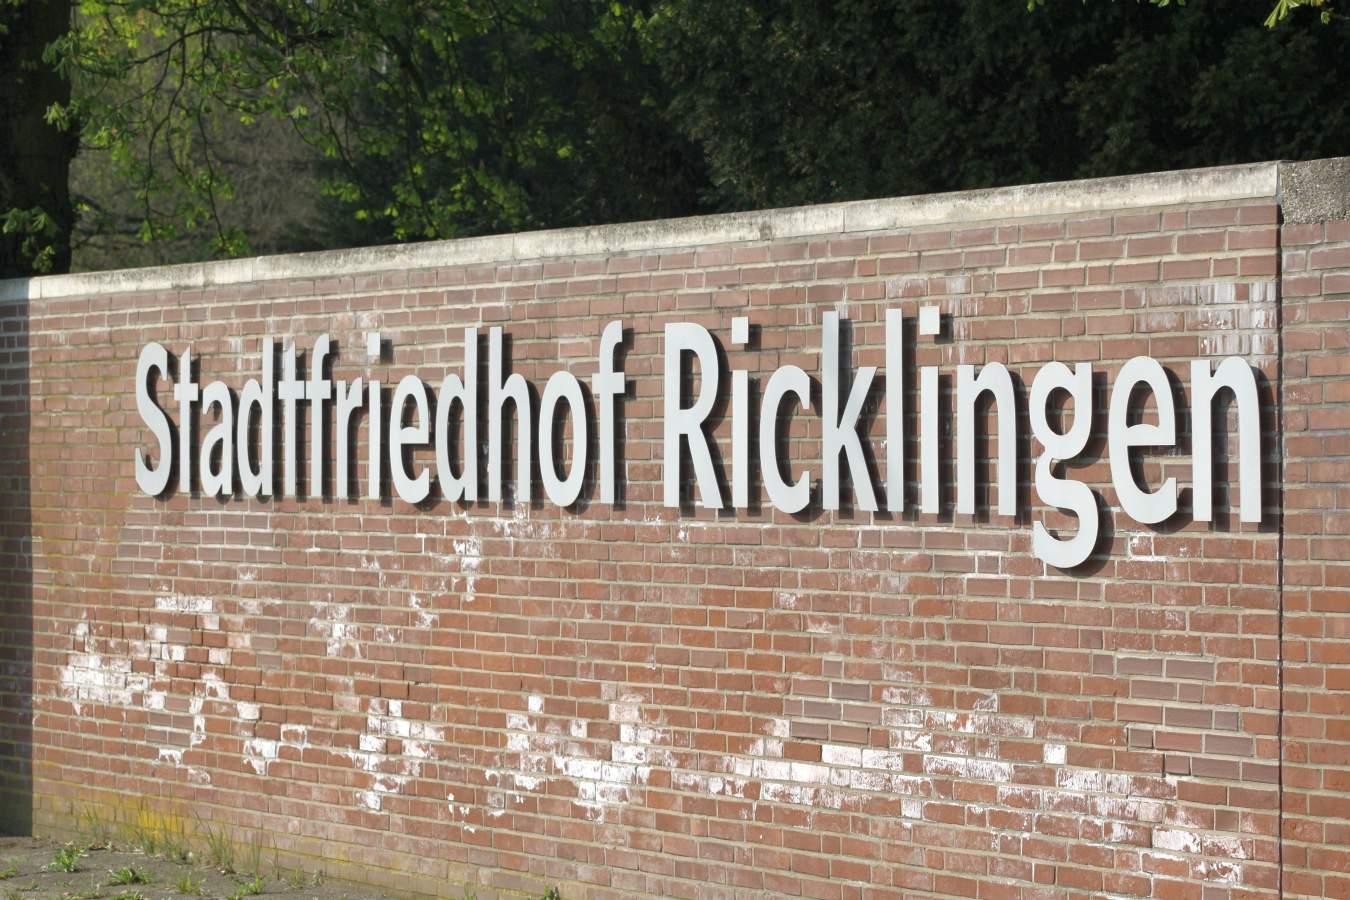 Stadtfriedhof Ricklingen